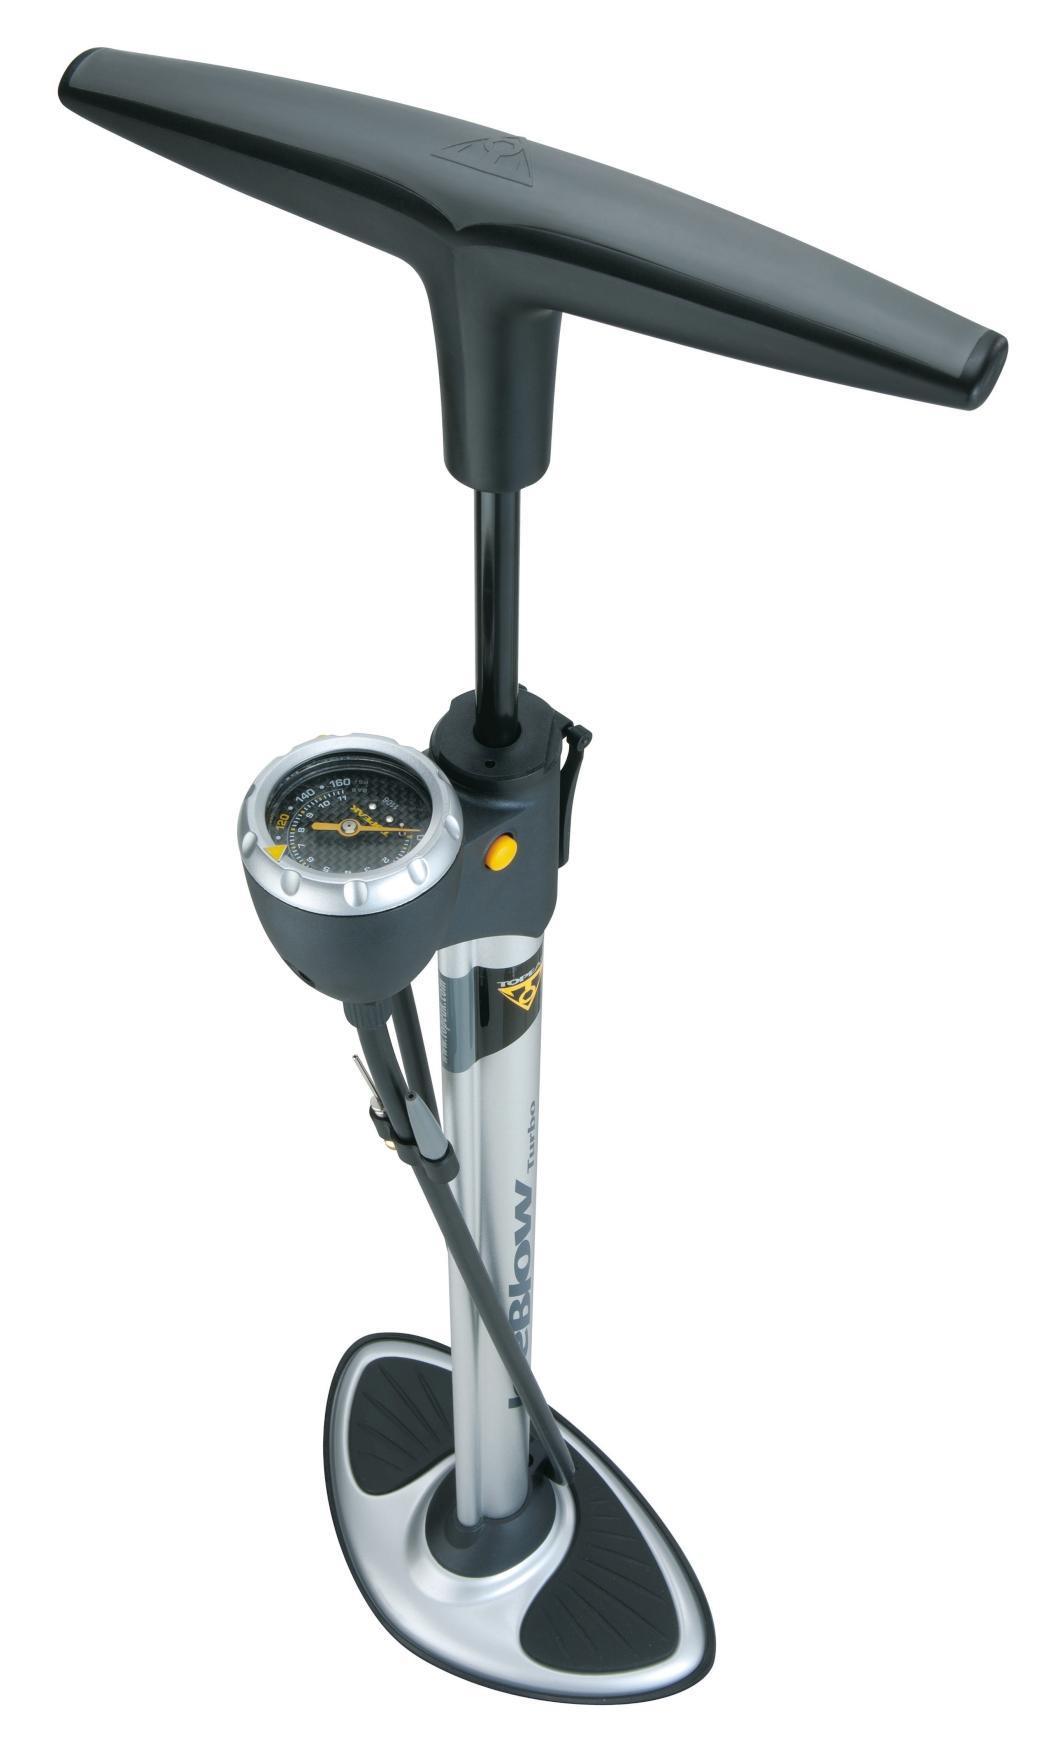 Topeak JoeBlow™ Turbo Standpumpe